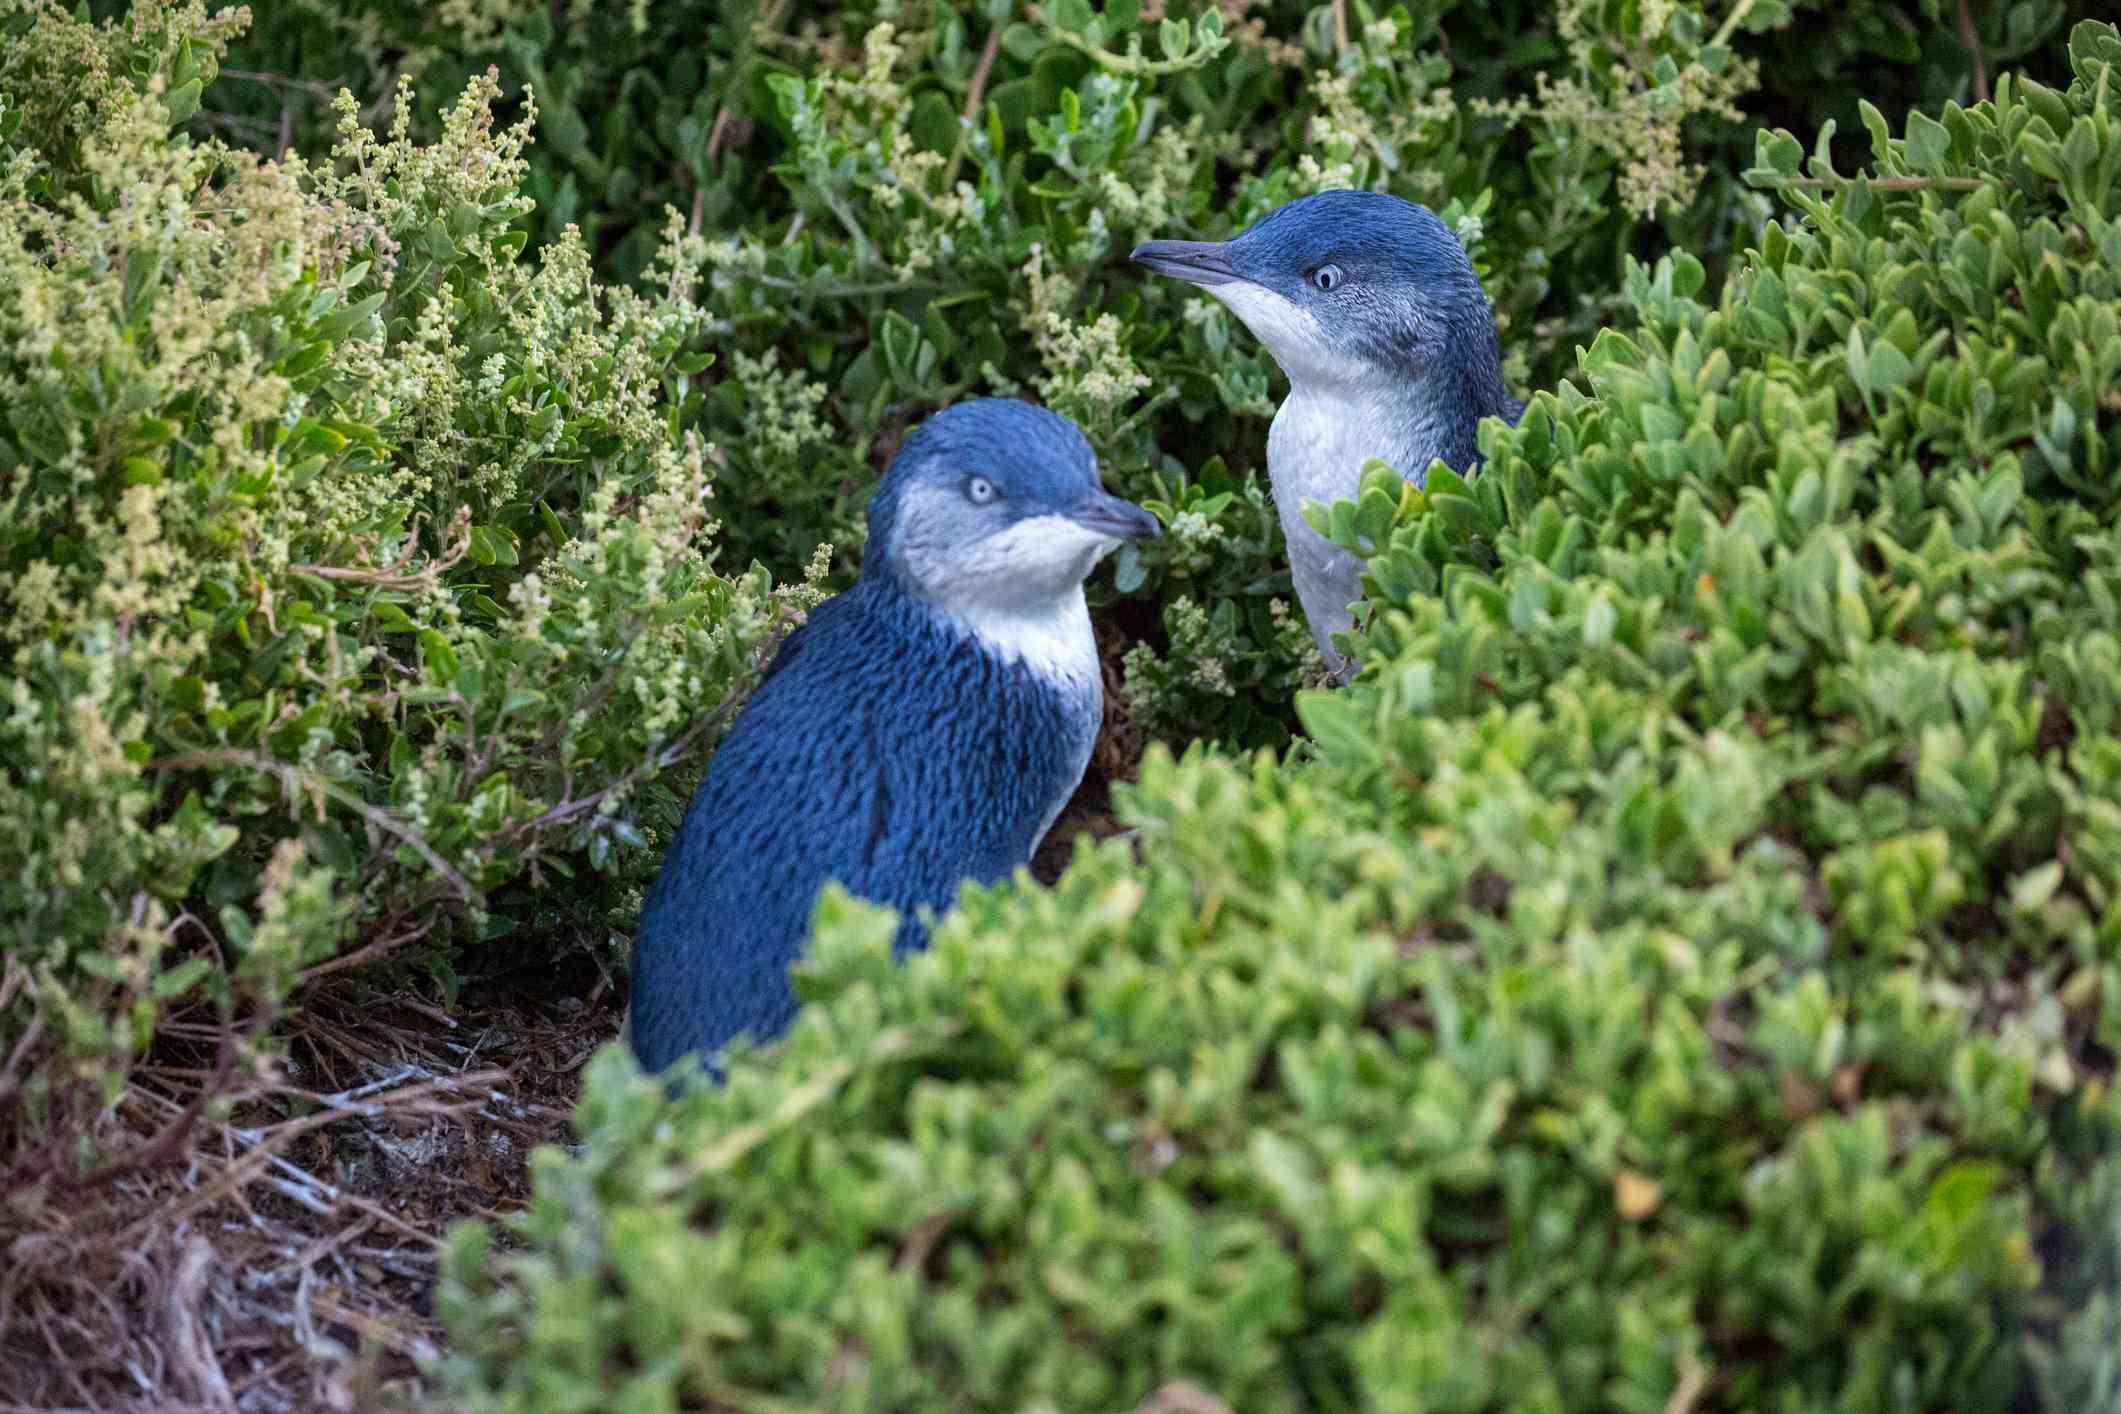 Australia: pair of young blue Fairy Penguins